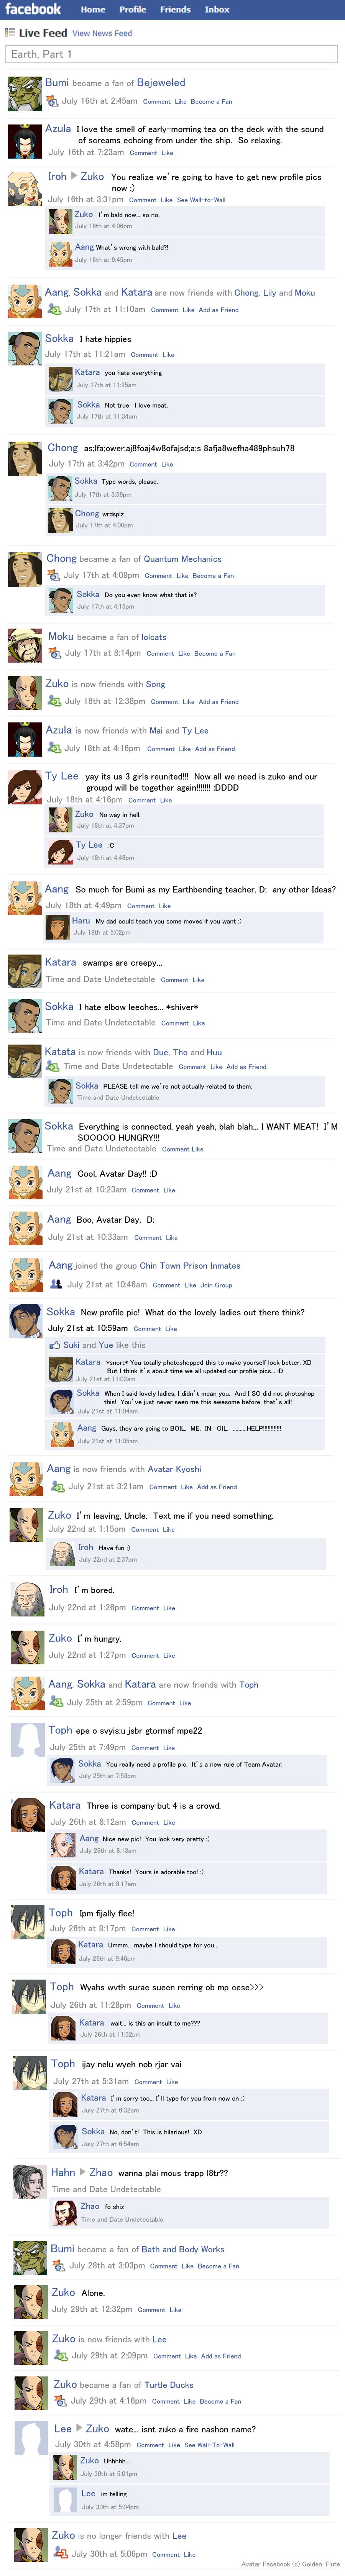 Avatar Facebook Earth Part 1 by Golden-Flute